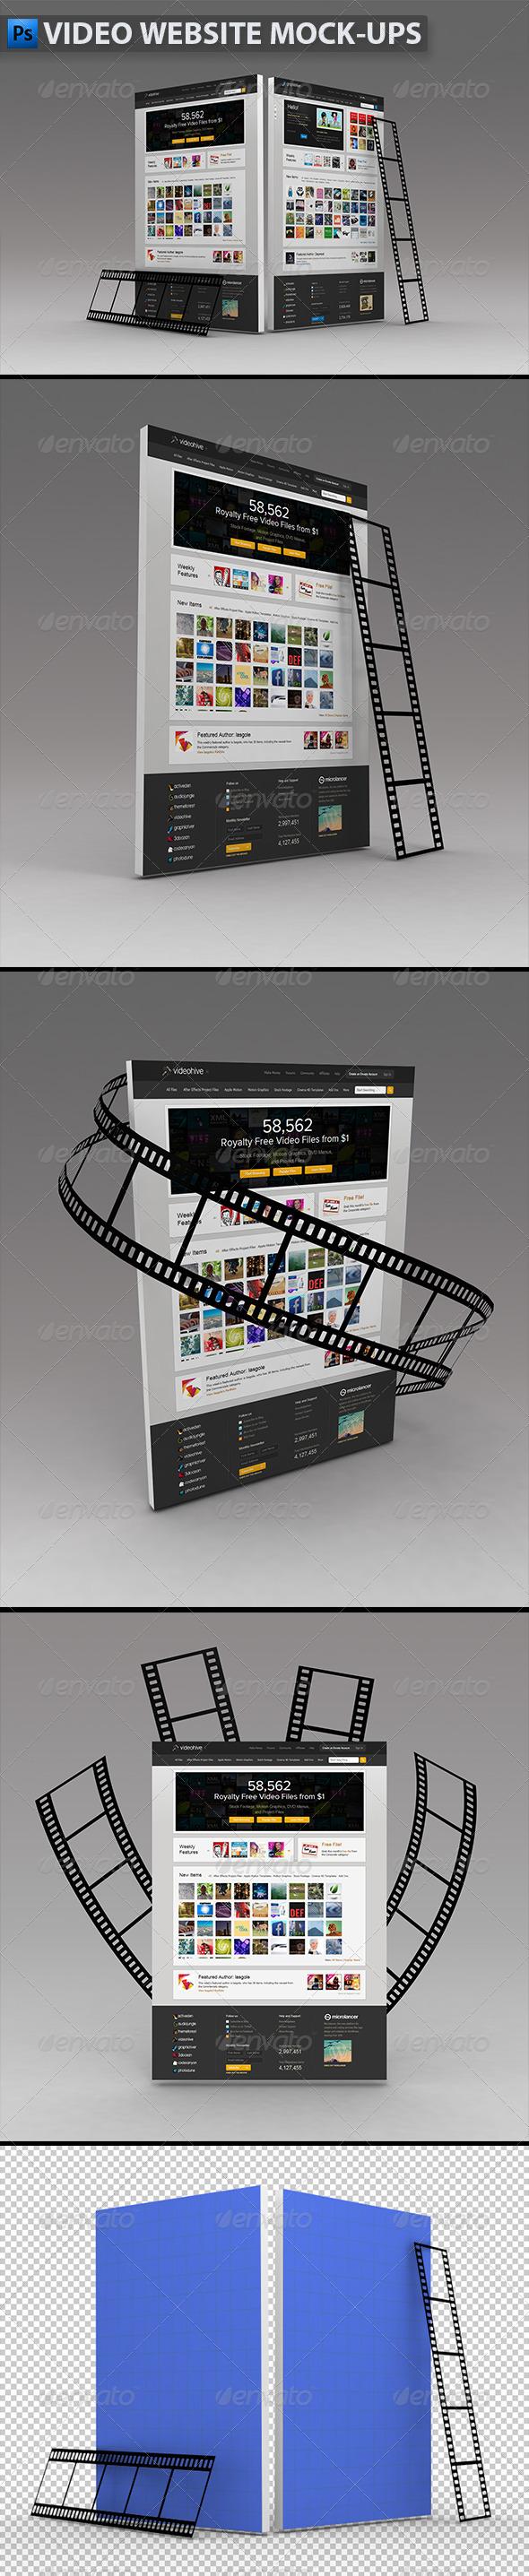 GraphicRiver Video Website Mock-ups 5697872